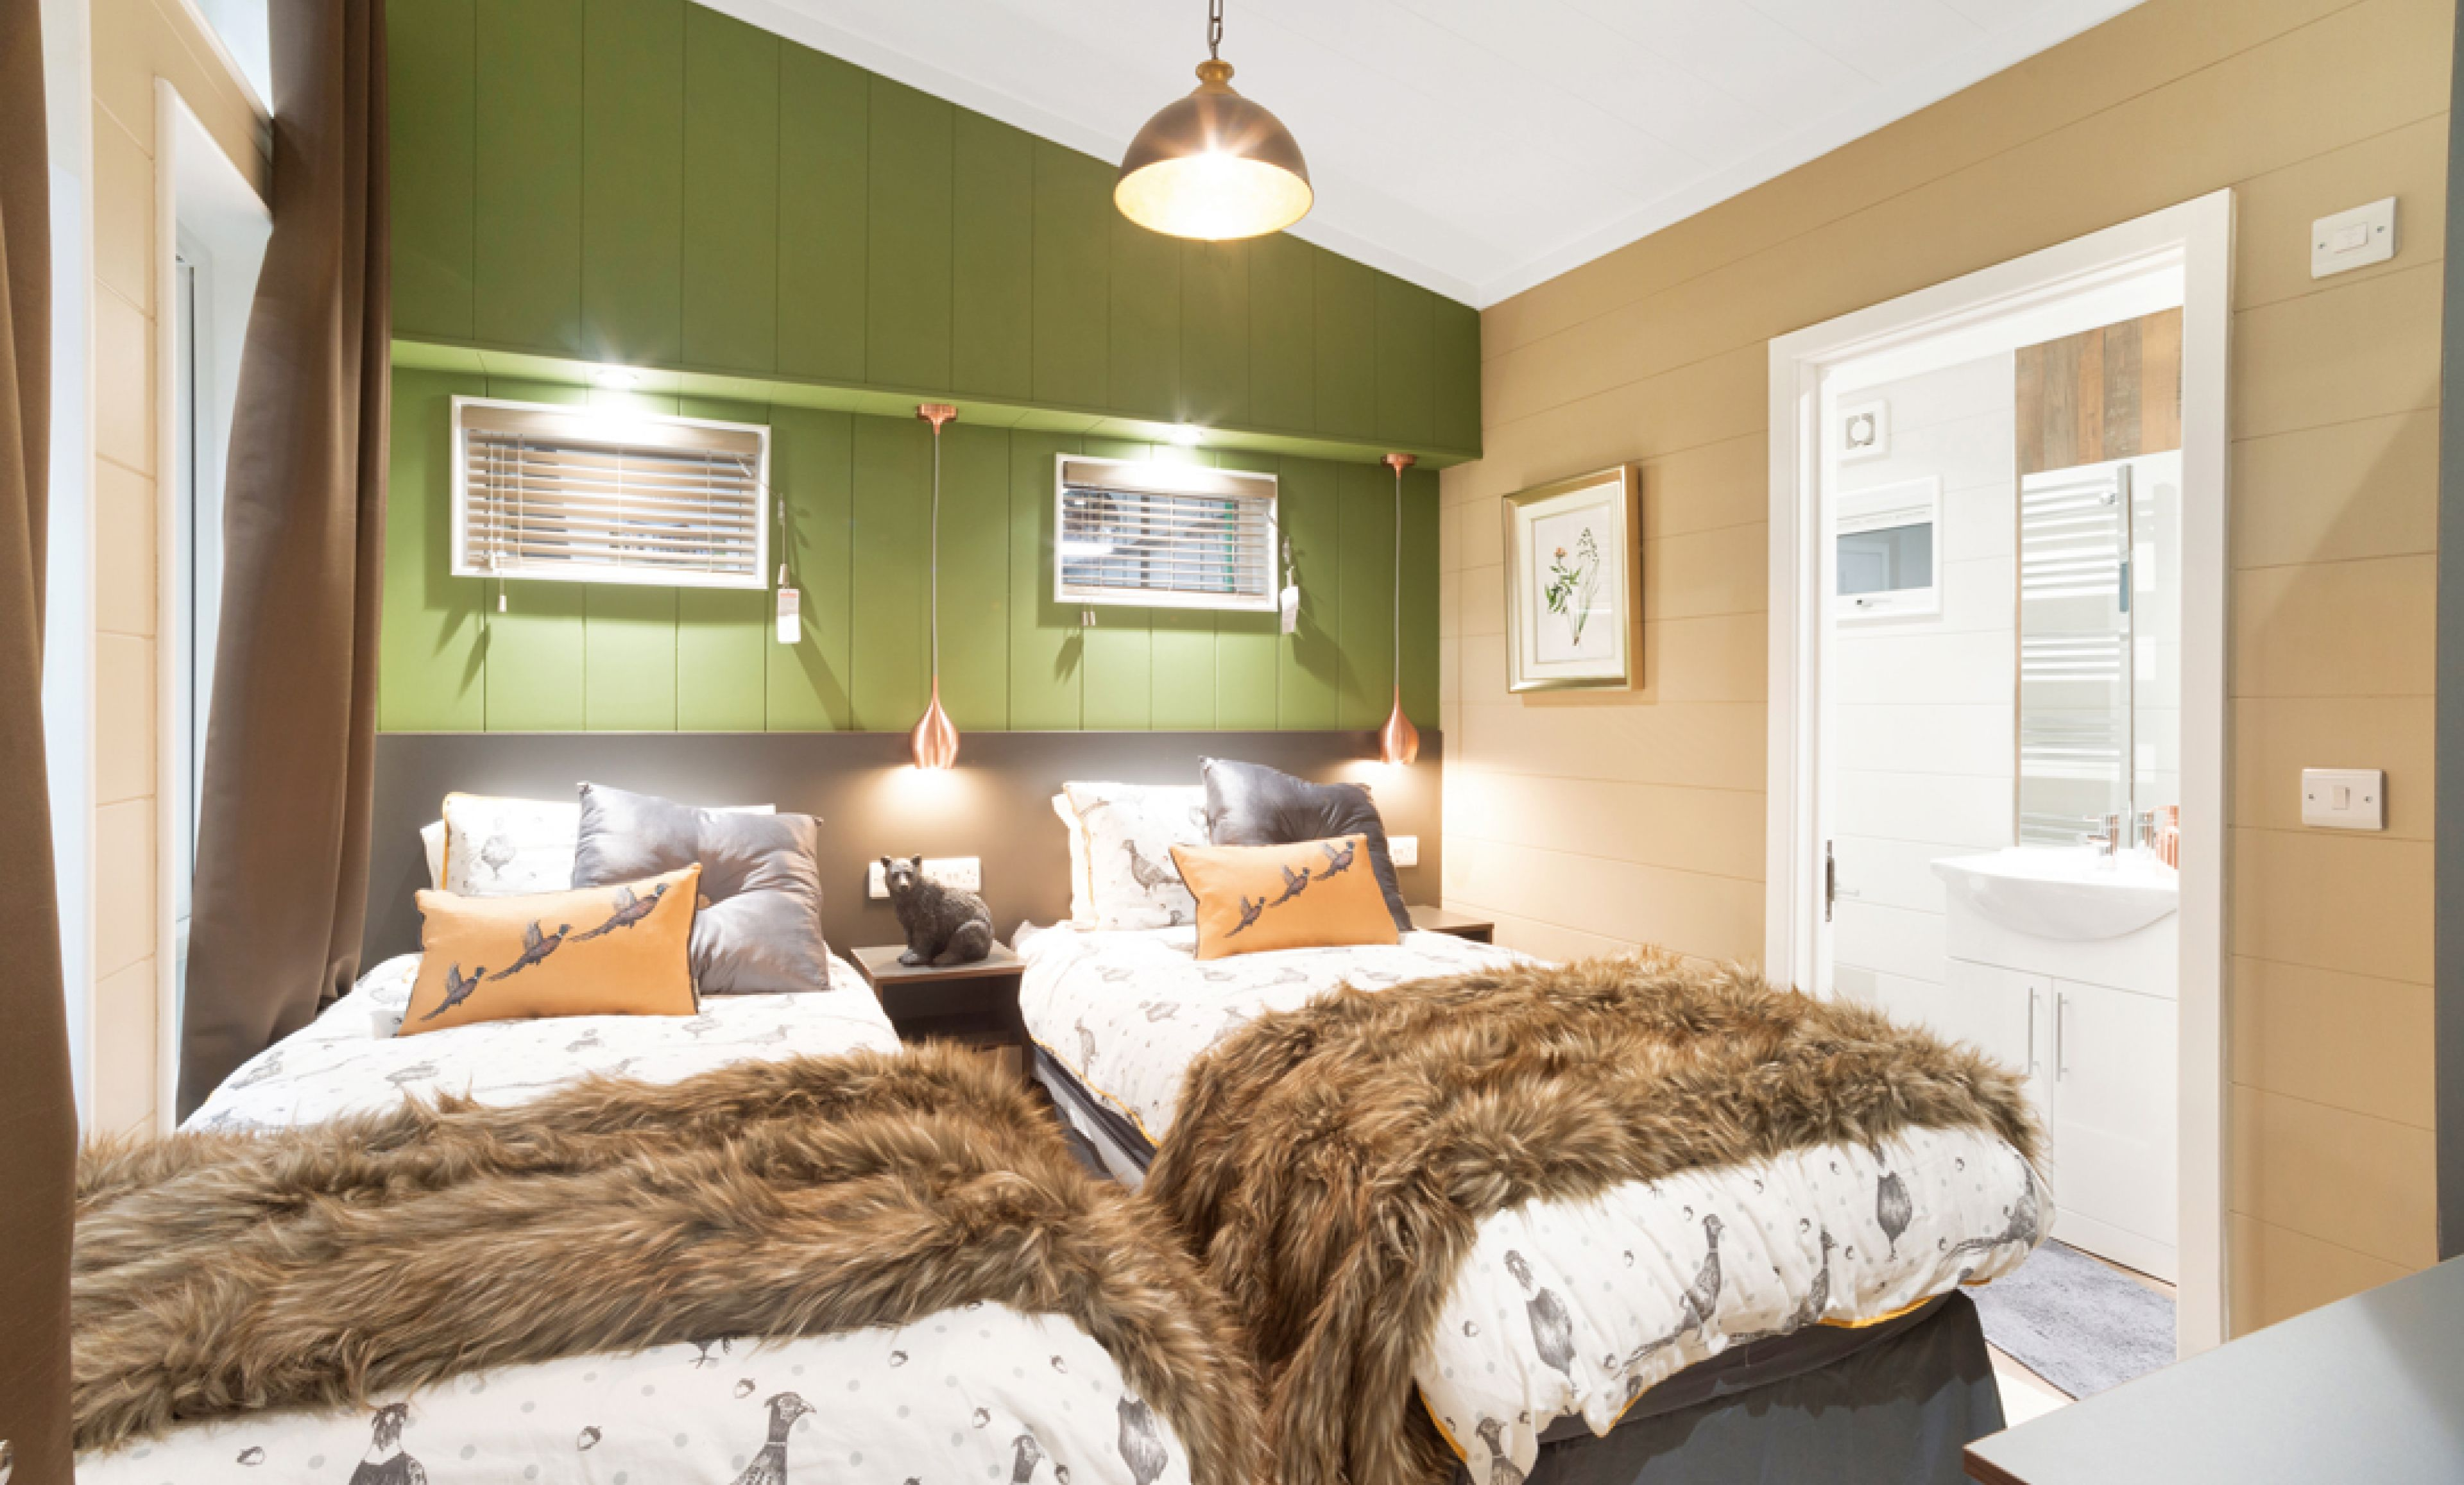 The Savannah Centre Lounge - Centre Lounge - Twin Room